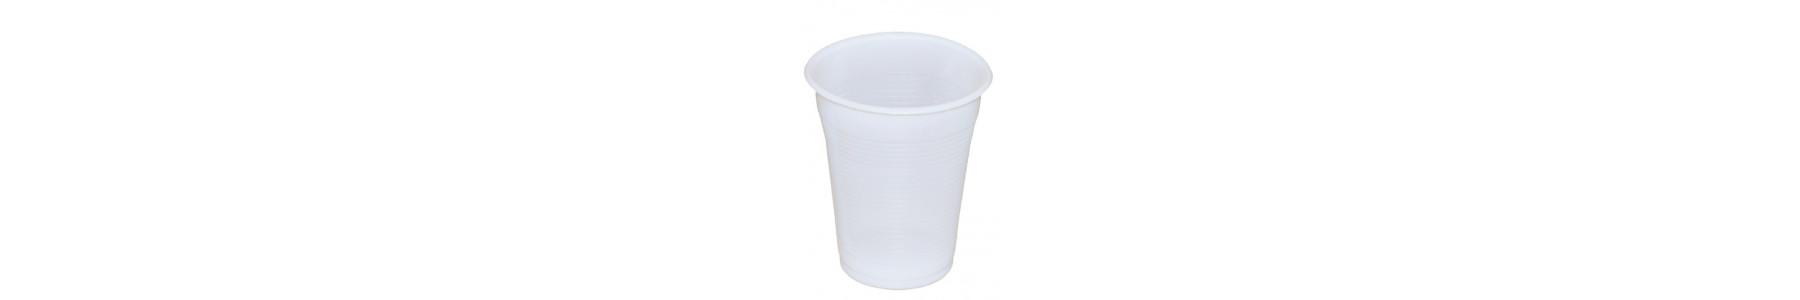 Pahare plastic de unica folosinta